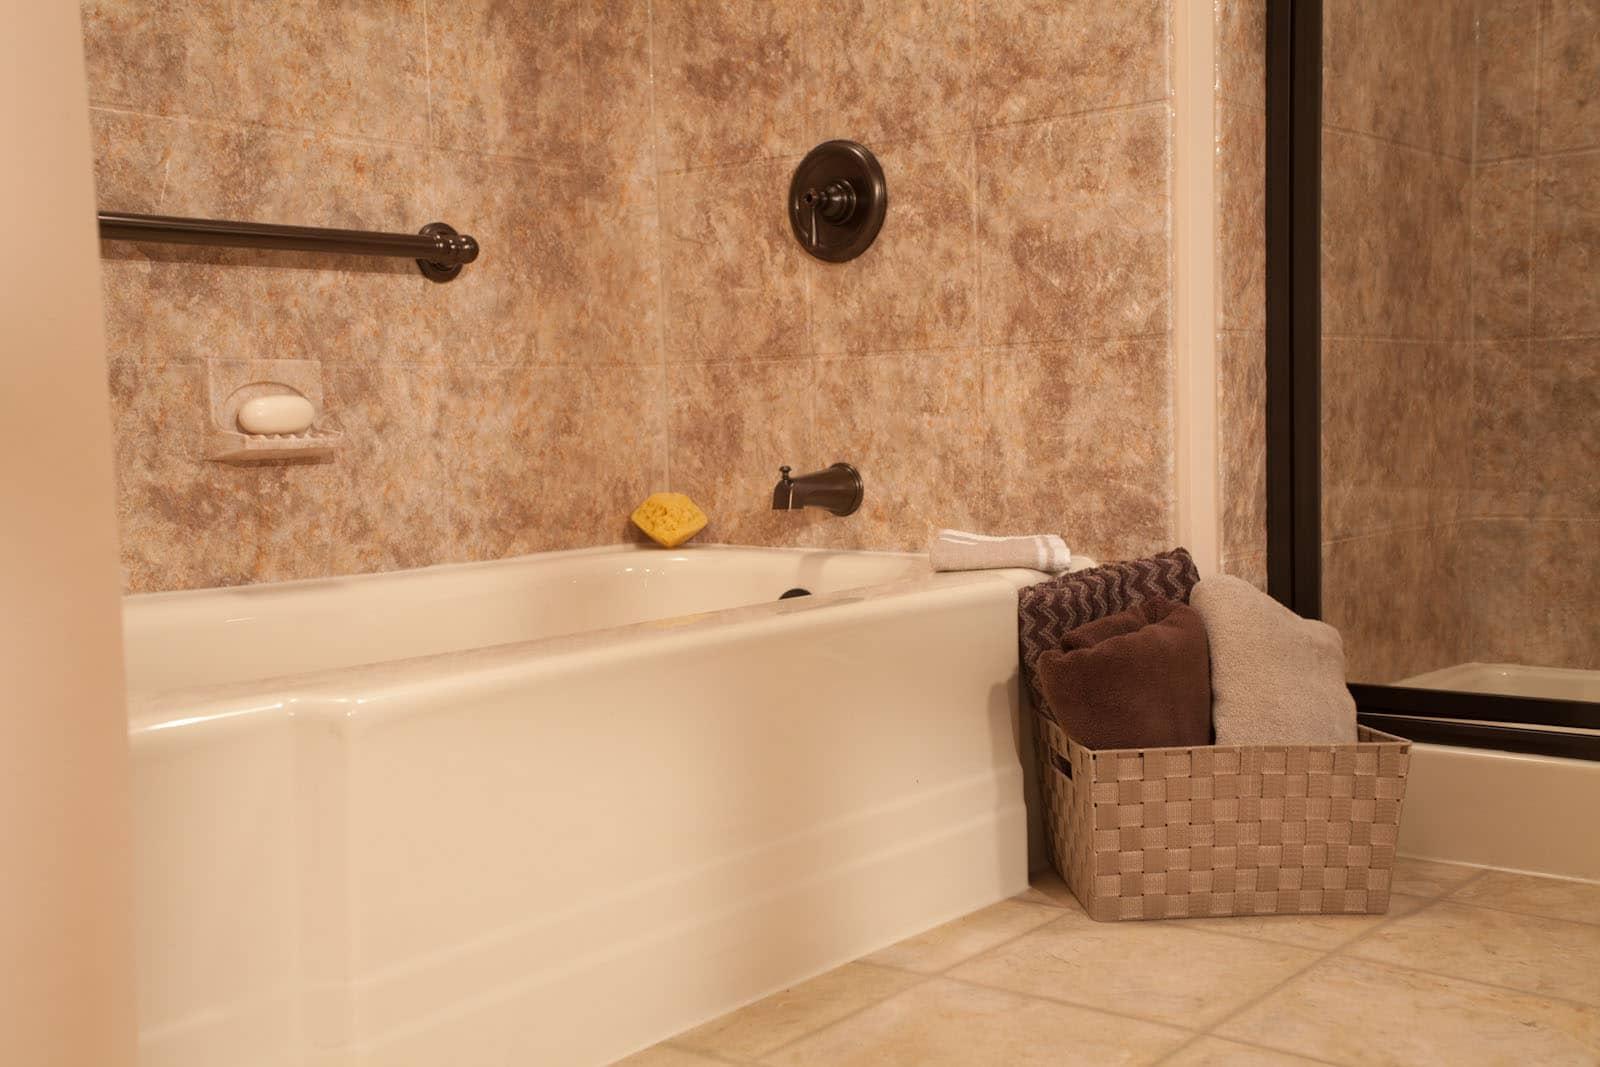 South Florida Bath Replacement - Bathrooms Plus Inc (15)